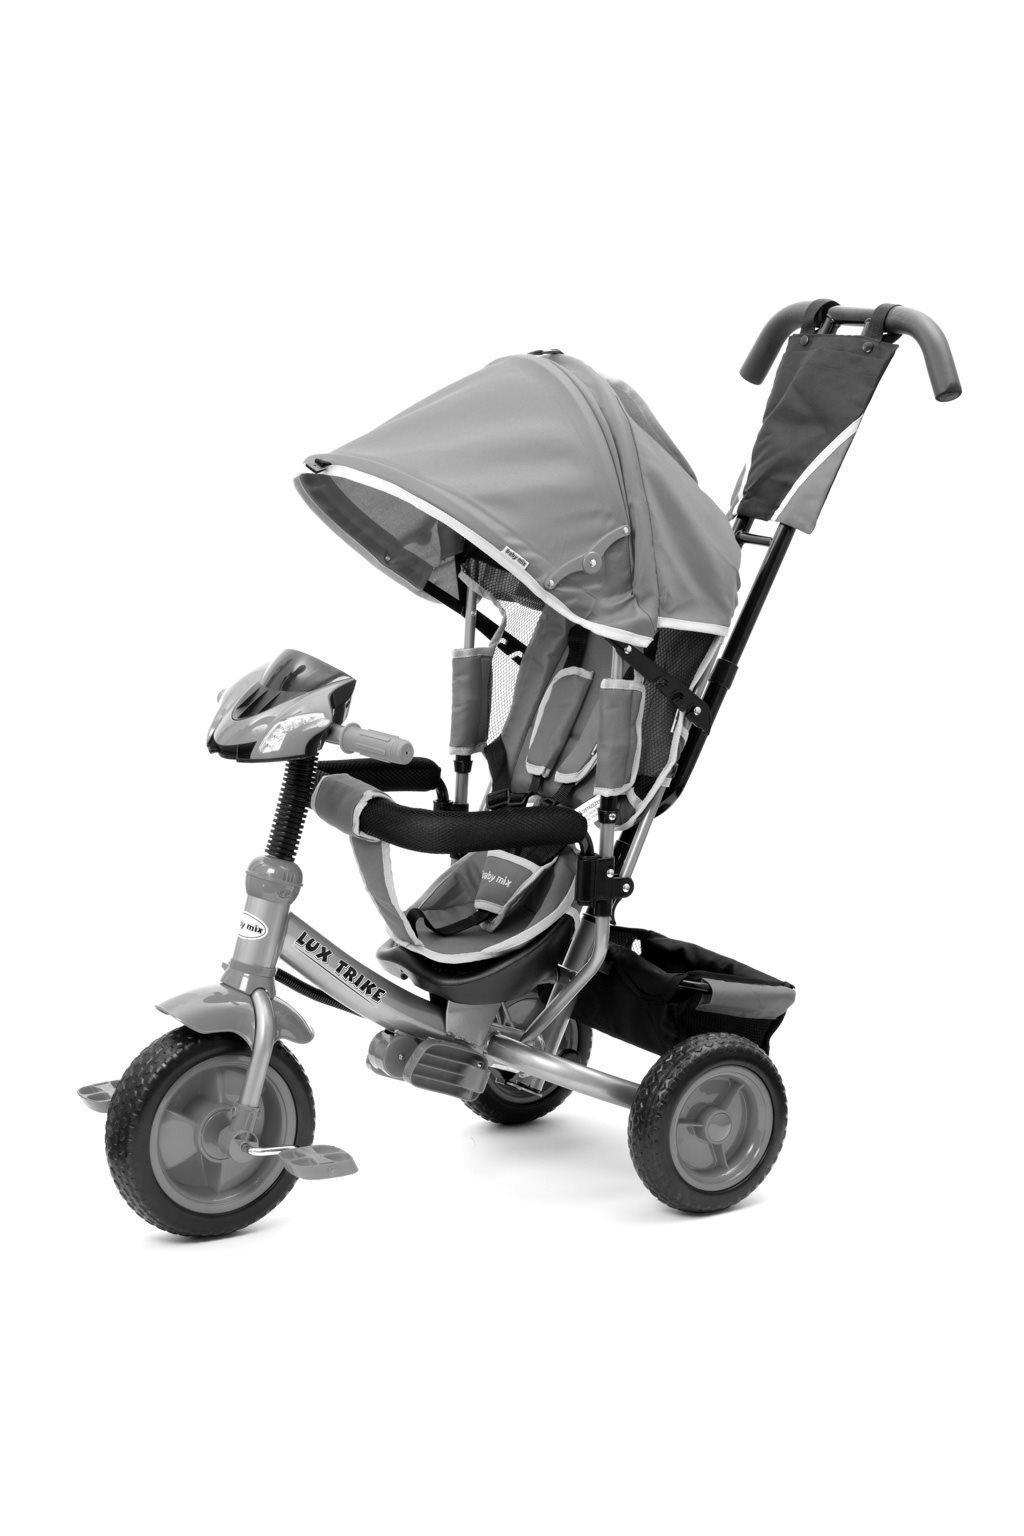 Detská trojkolka so svetlami Baby Mix Lux Trike sivá